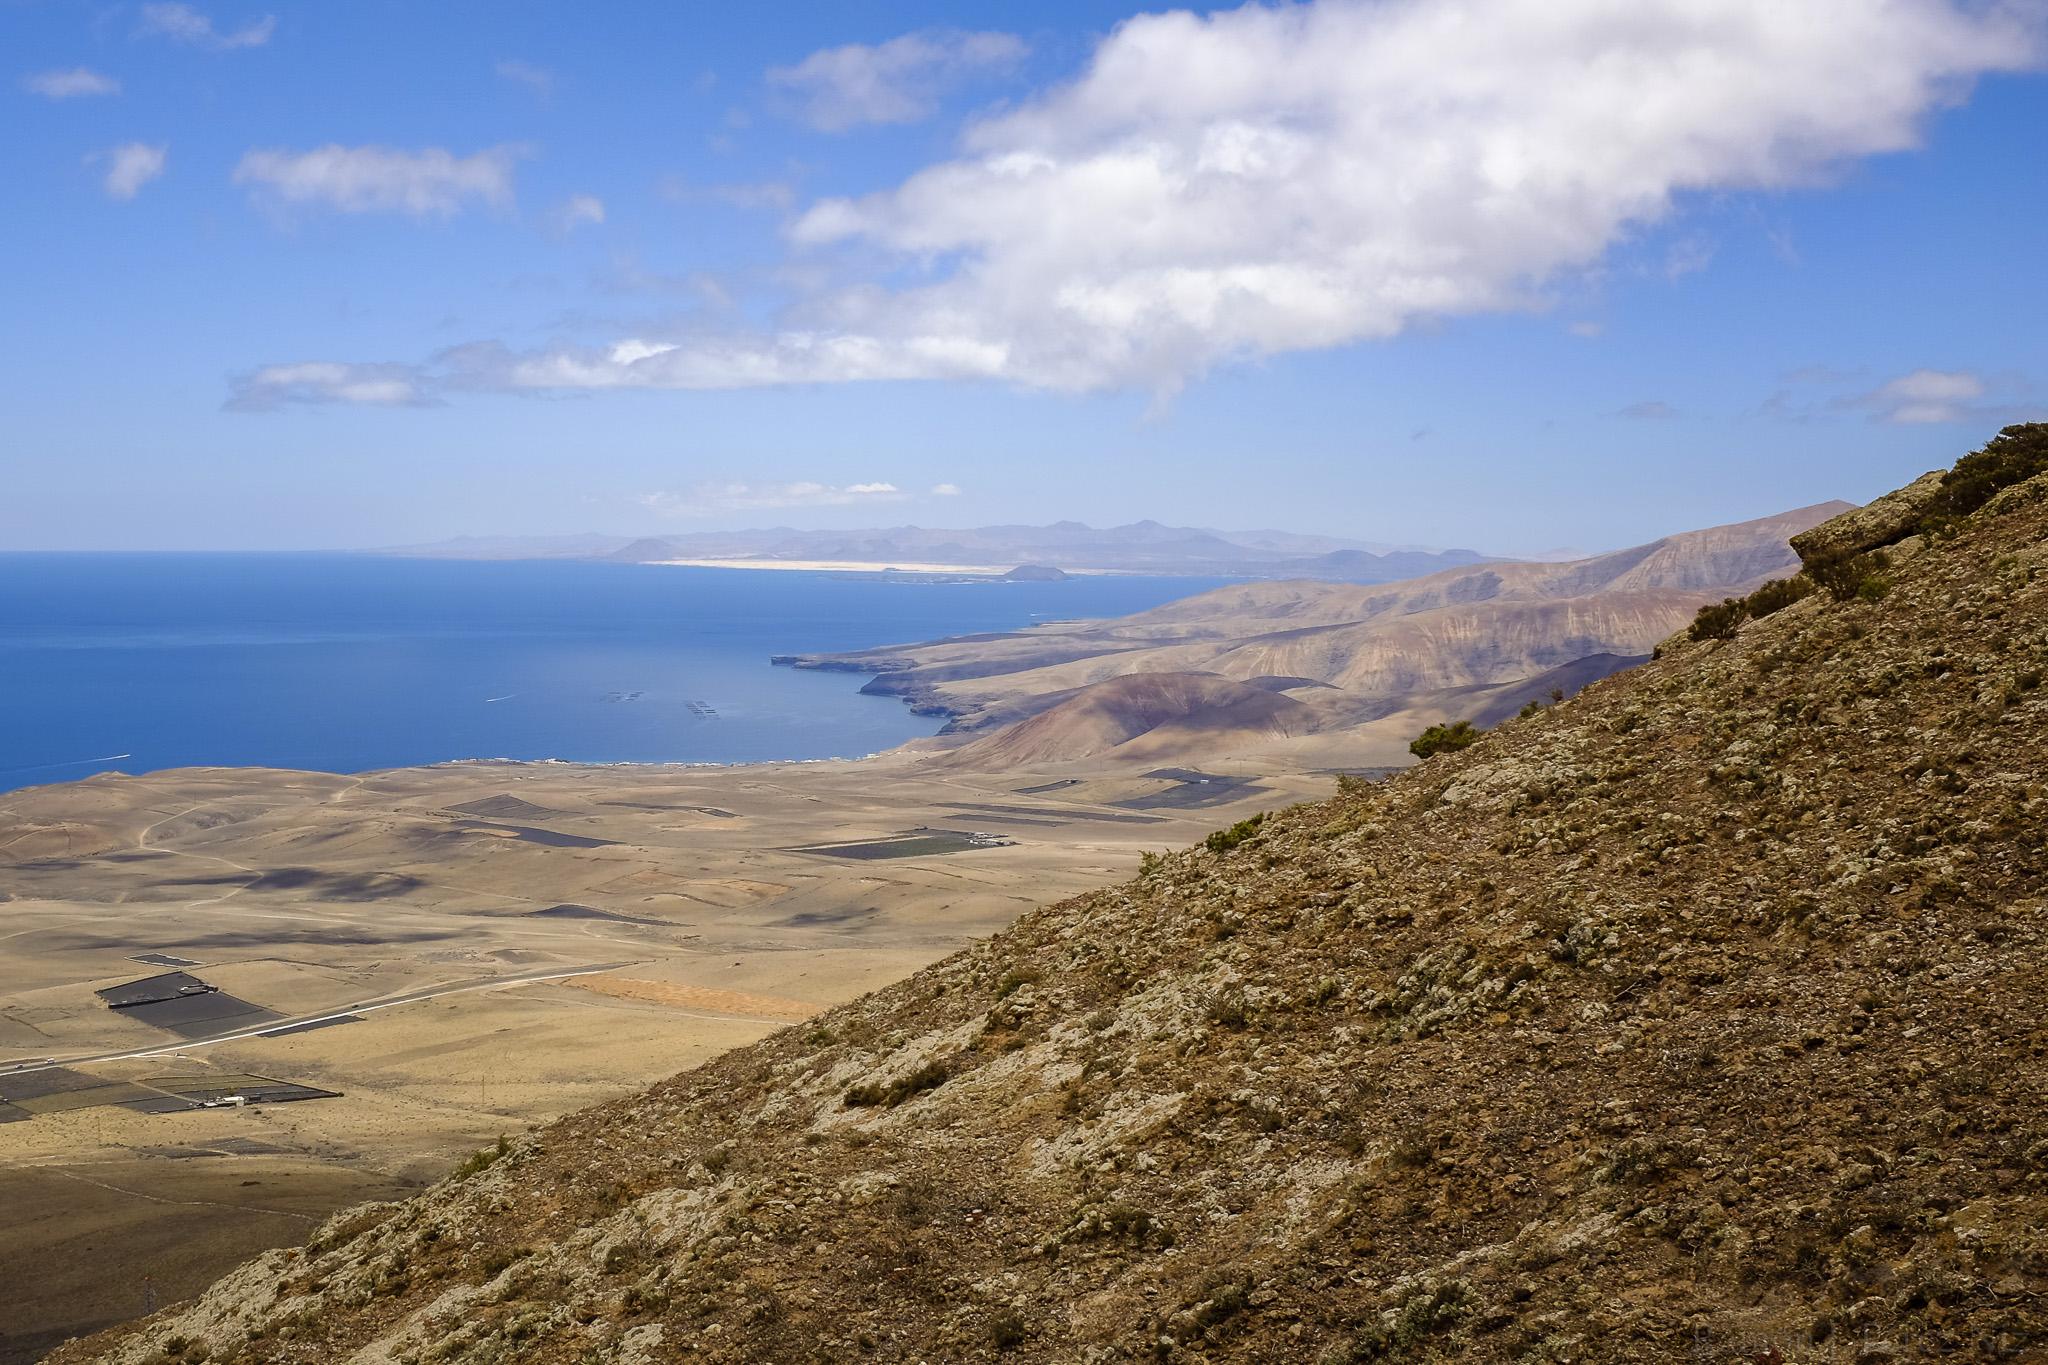 Foto de Ramón Pérez Niz. Playa Quemada Ajaches y Fuerteventura